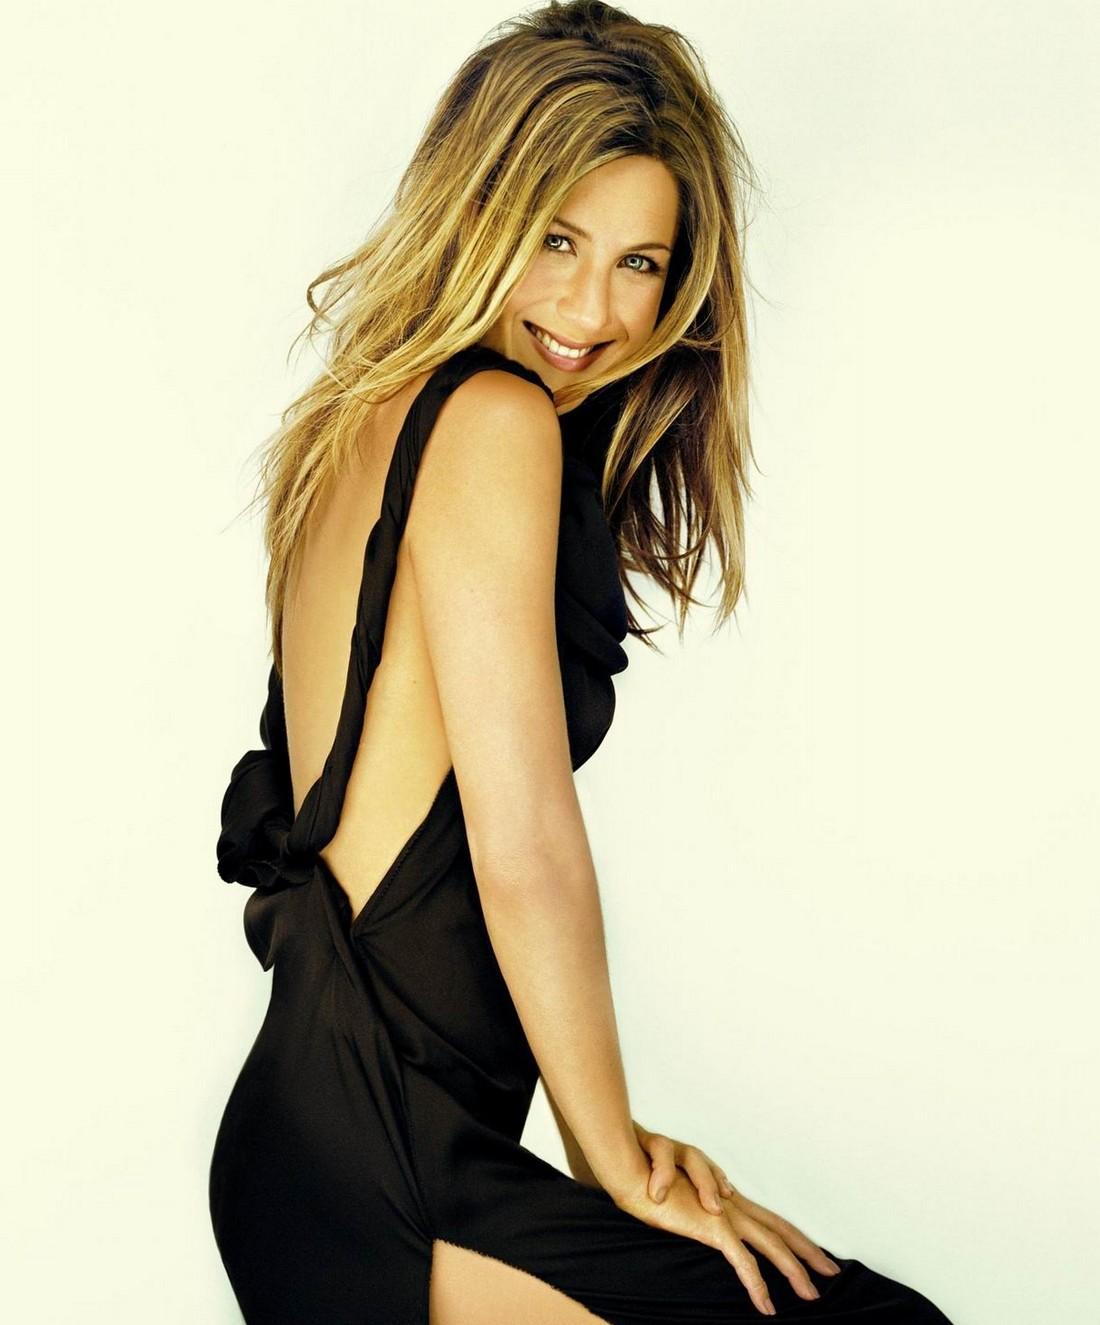 http://2.bp.blogspot.com/-rXS70TR-6kA/Tzcc0FEyMDI/AAAAAAAAFFk/a-4odMN4JRk/s1600/Jennifer+Aniston+2011+(2).jpg